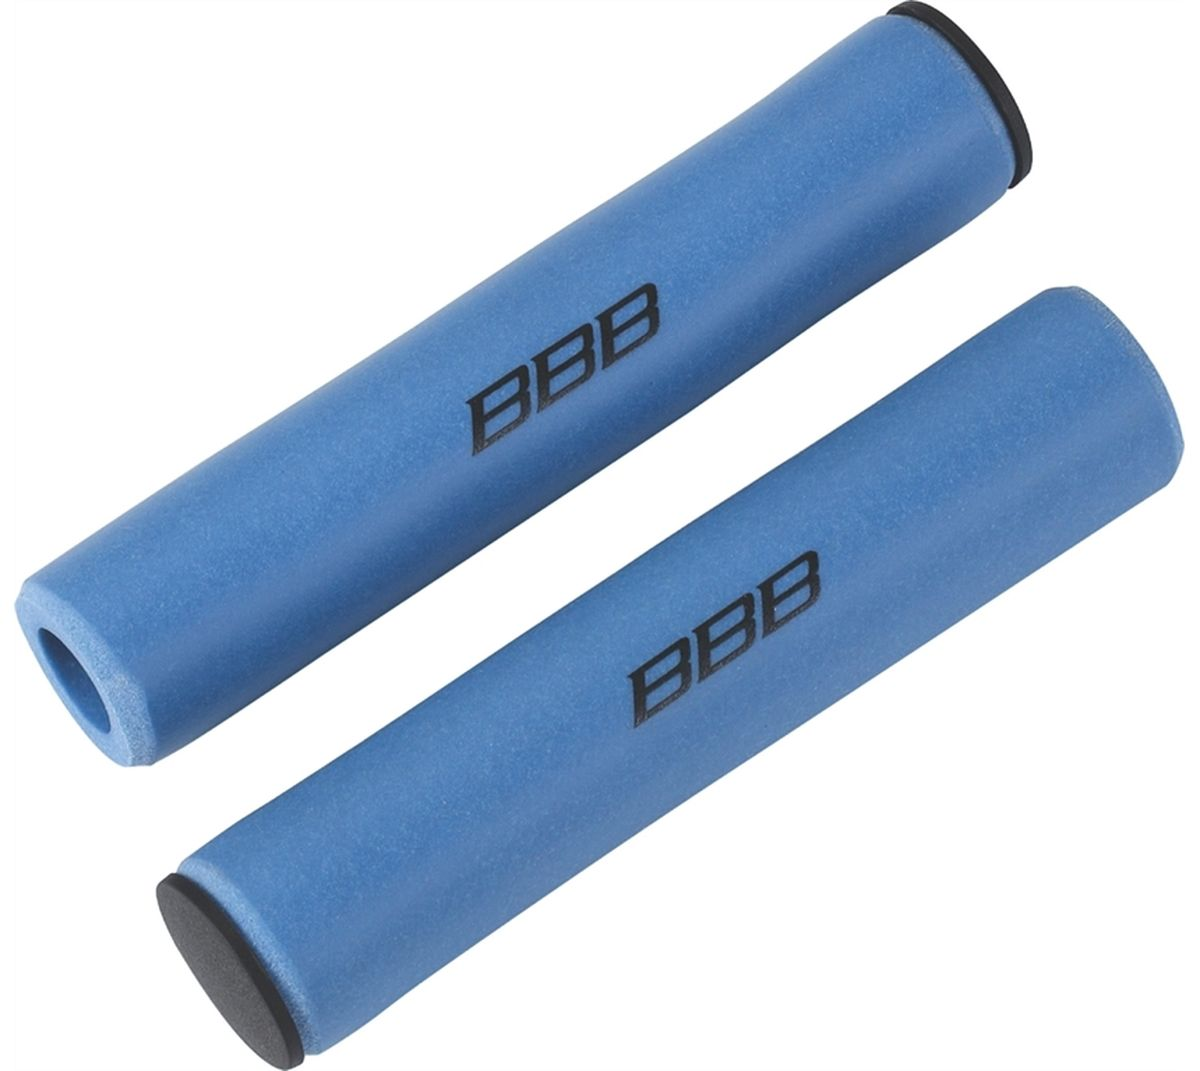 Грипсы BBB Sticky, цвет: синий, 13 см, 2 шт. BHG-34 грипсы bbb